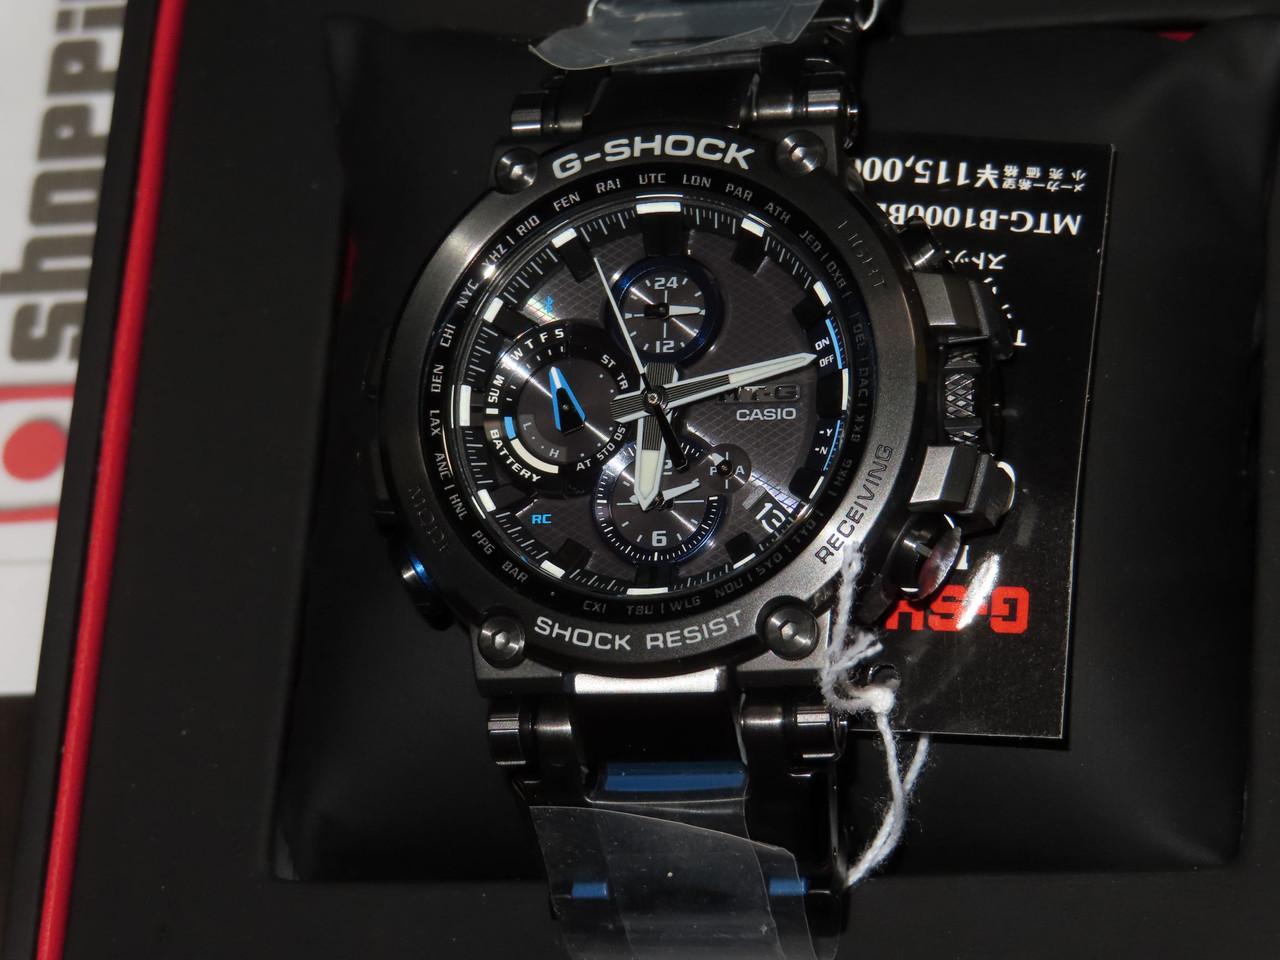 G-Shock MTG-B1000BD-1AJF Metal Twisted G